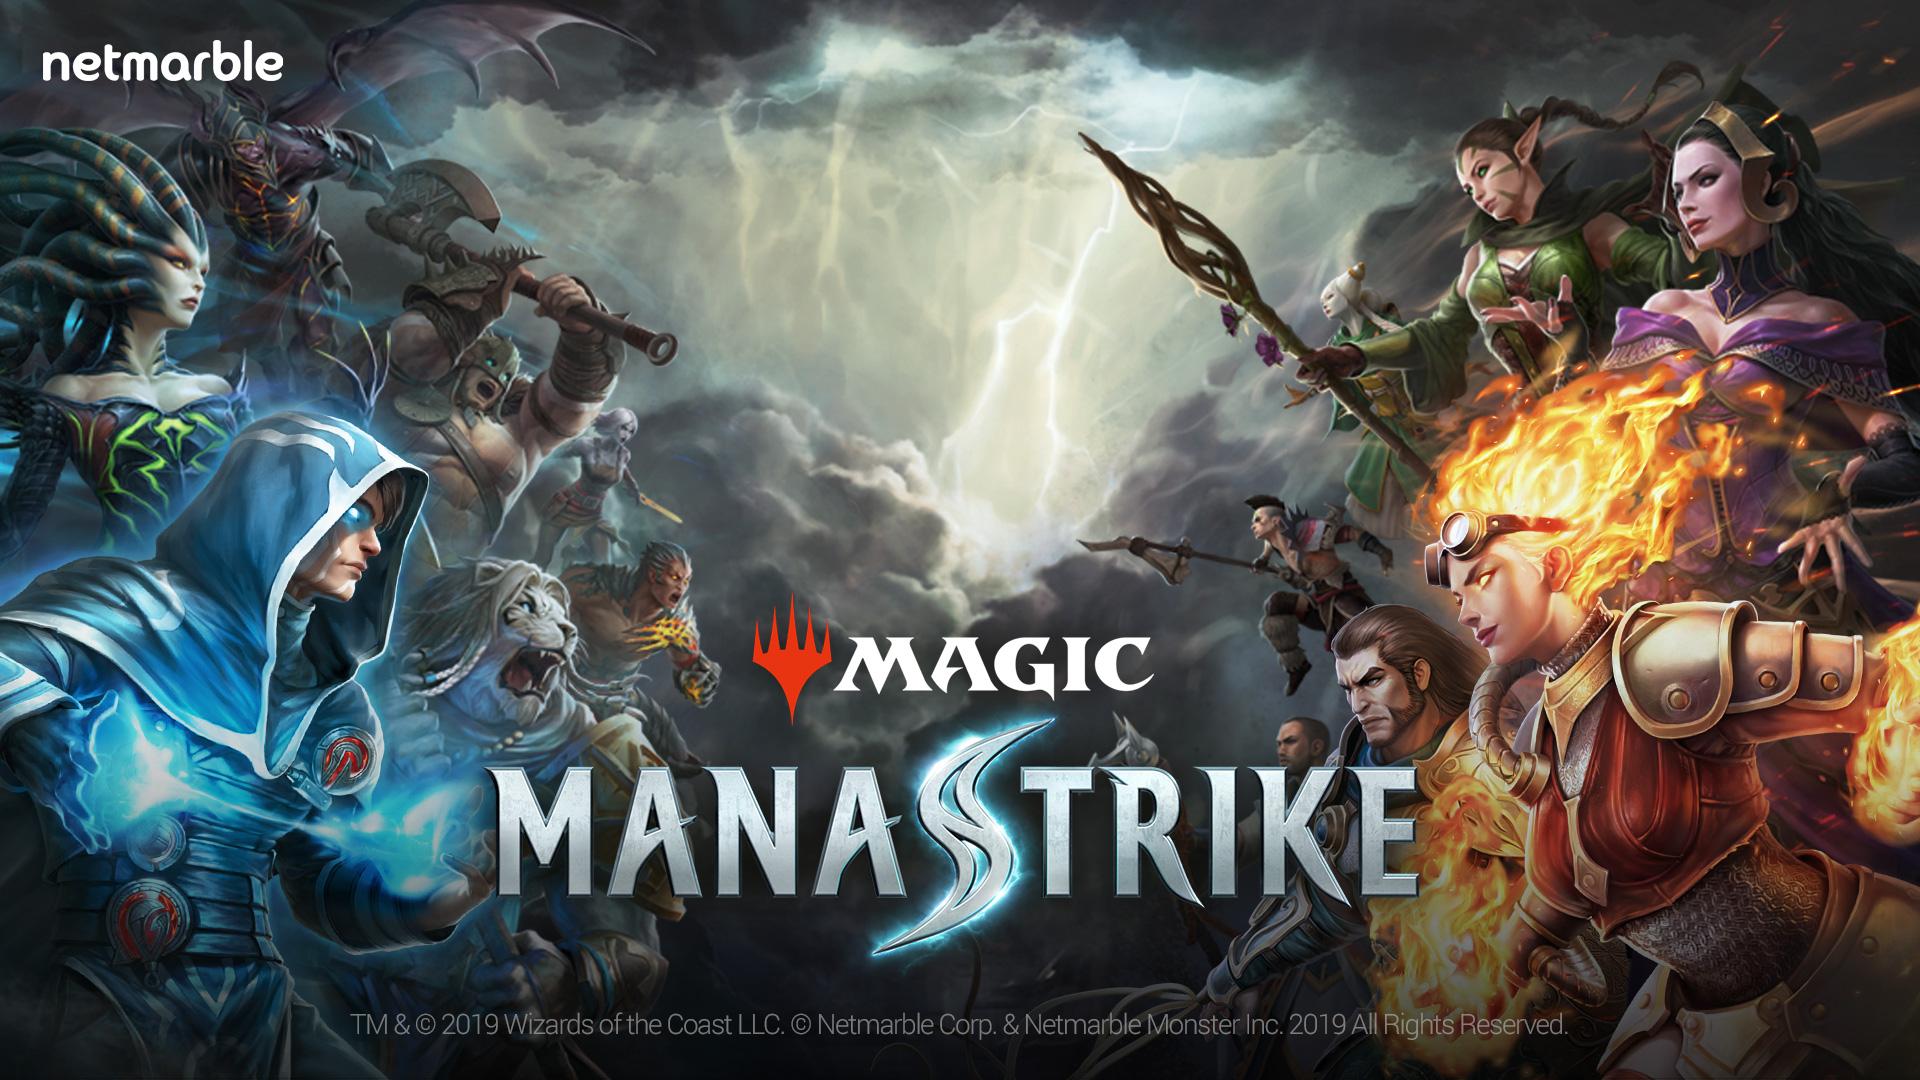 MAGIC MANASTRIKE 6112019 1